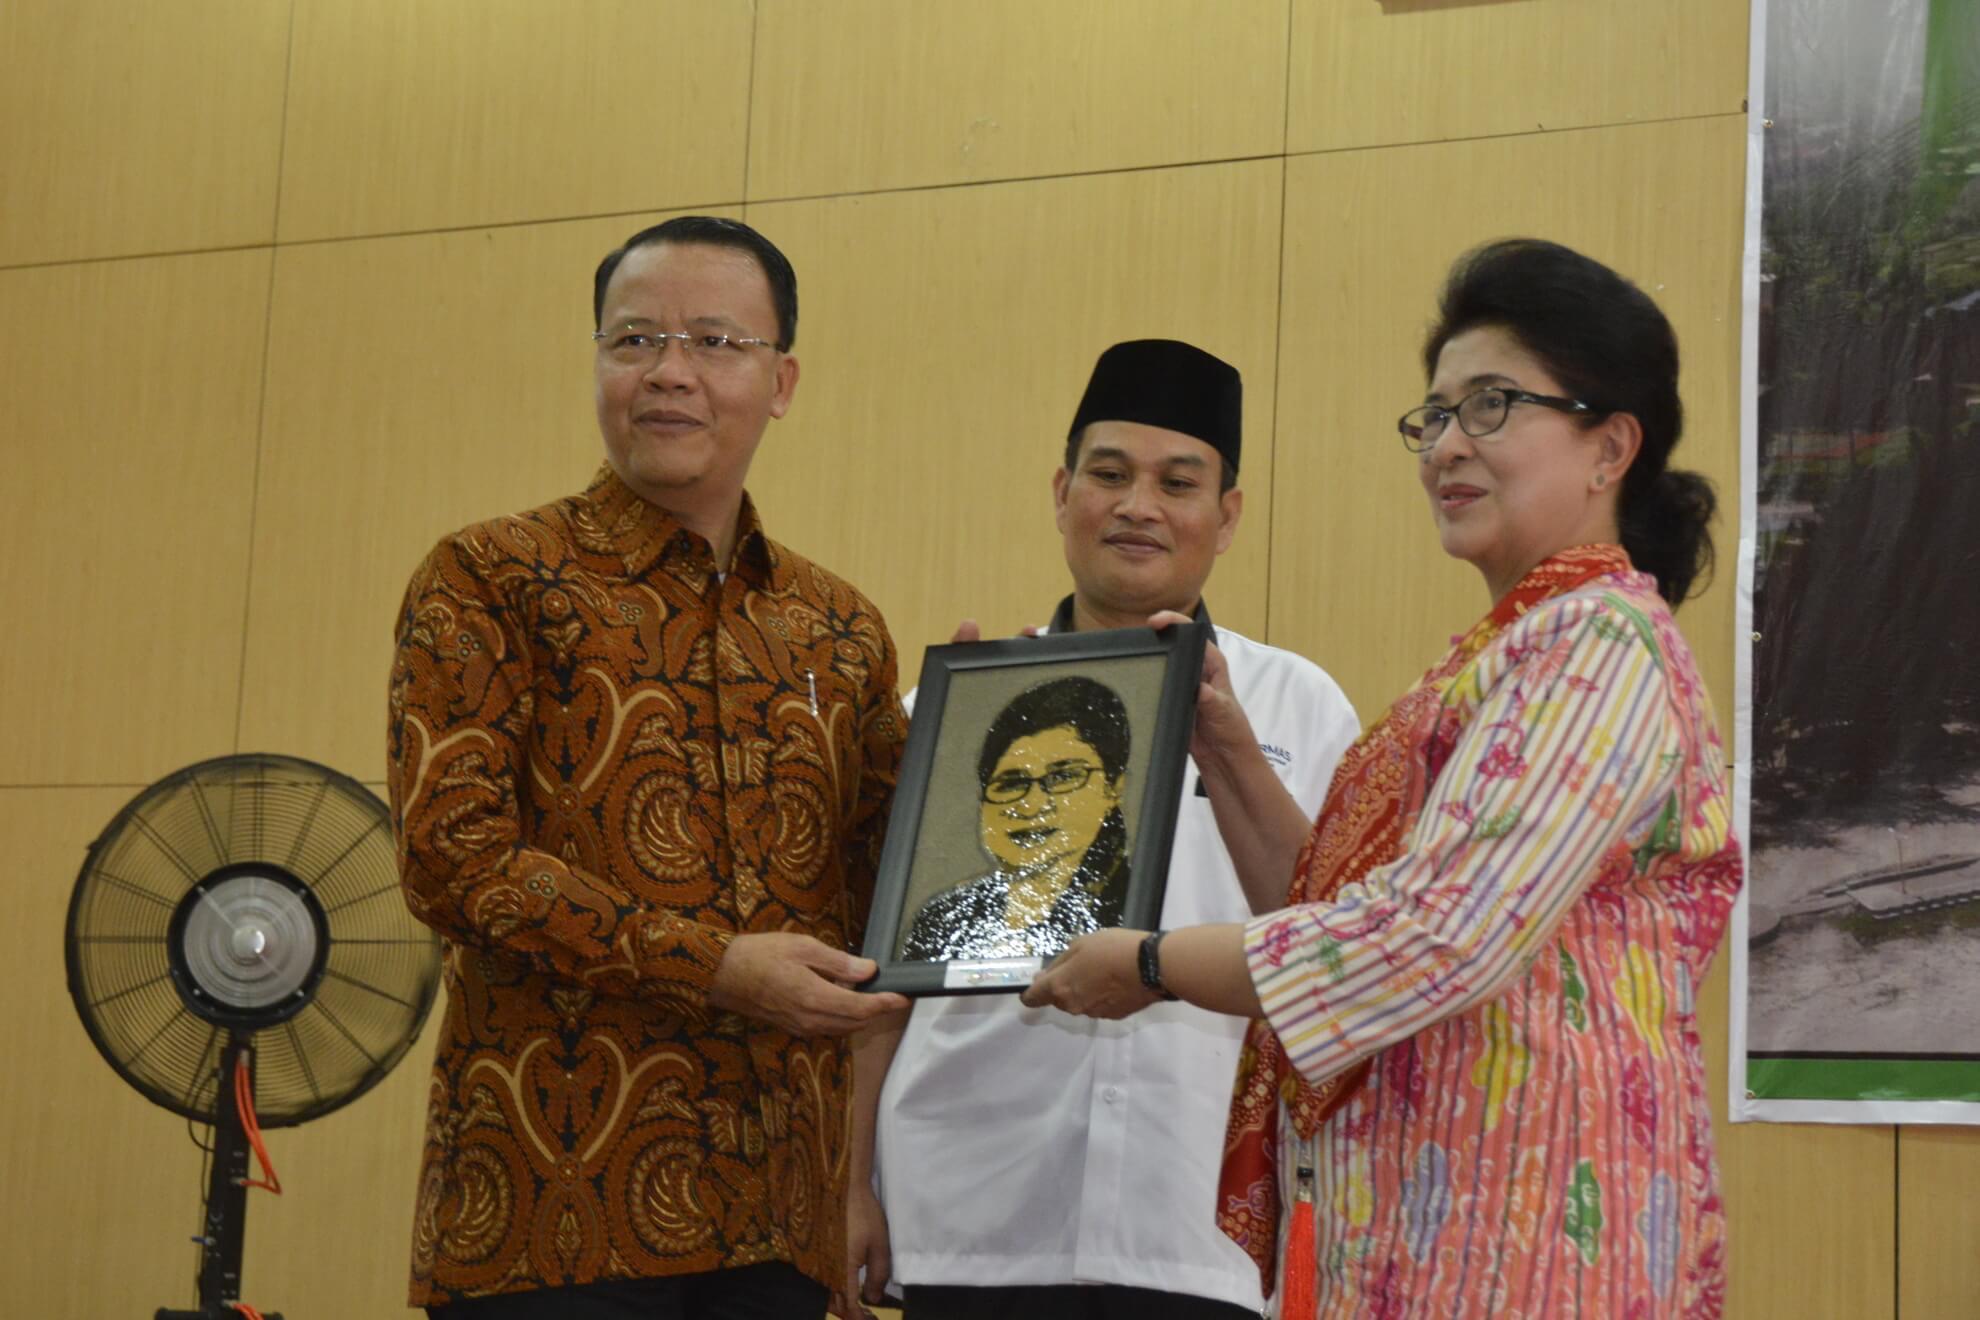 13-05-2017 Menkes Nila Moeloek Menerima Tanda Mata Karikatur dari Wakil Gubernur Bengkulu Rohidin Mersyah pad Acara Rakerkesda Provinsi Bengkulu (R46)